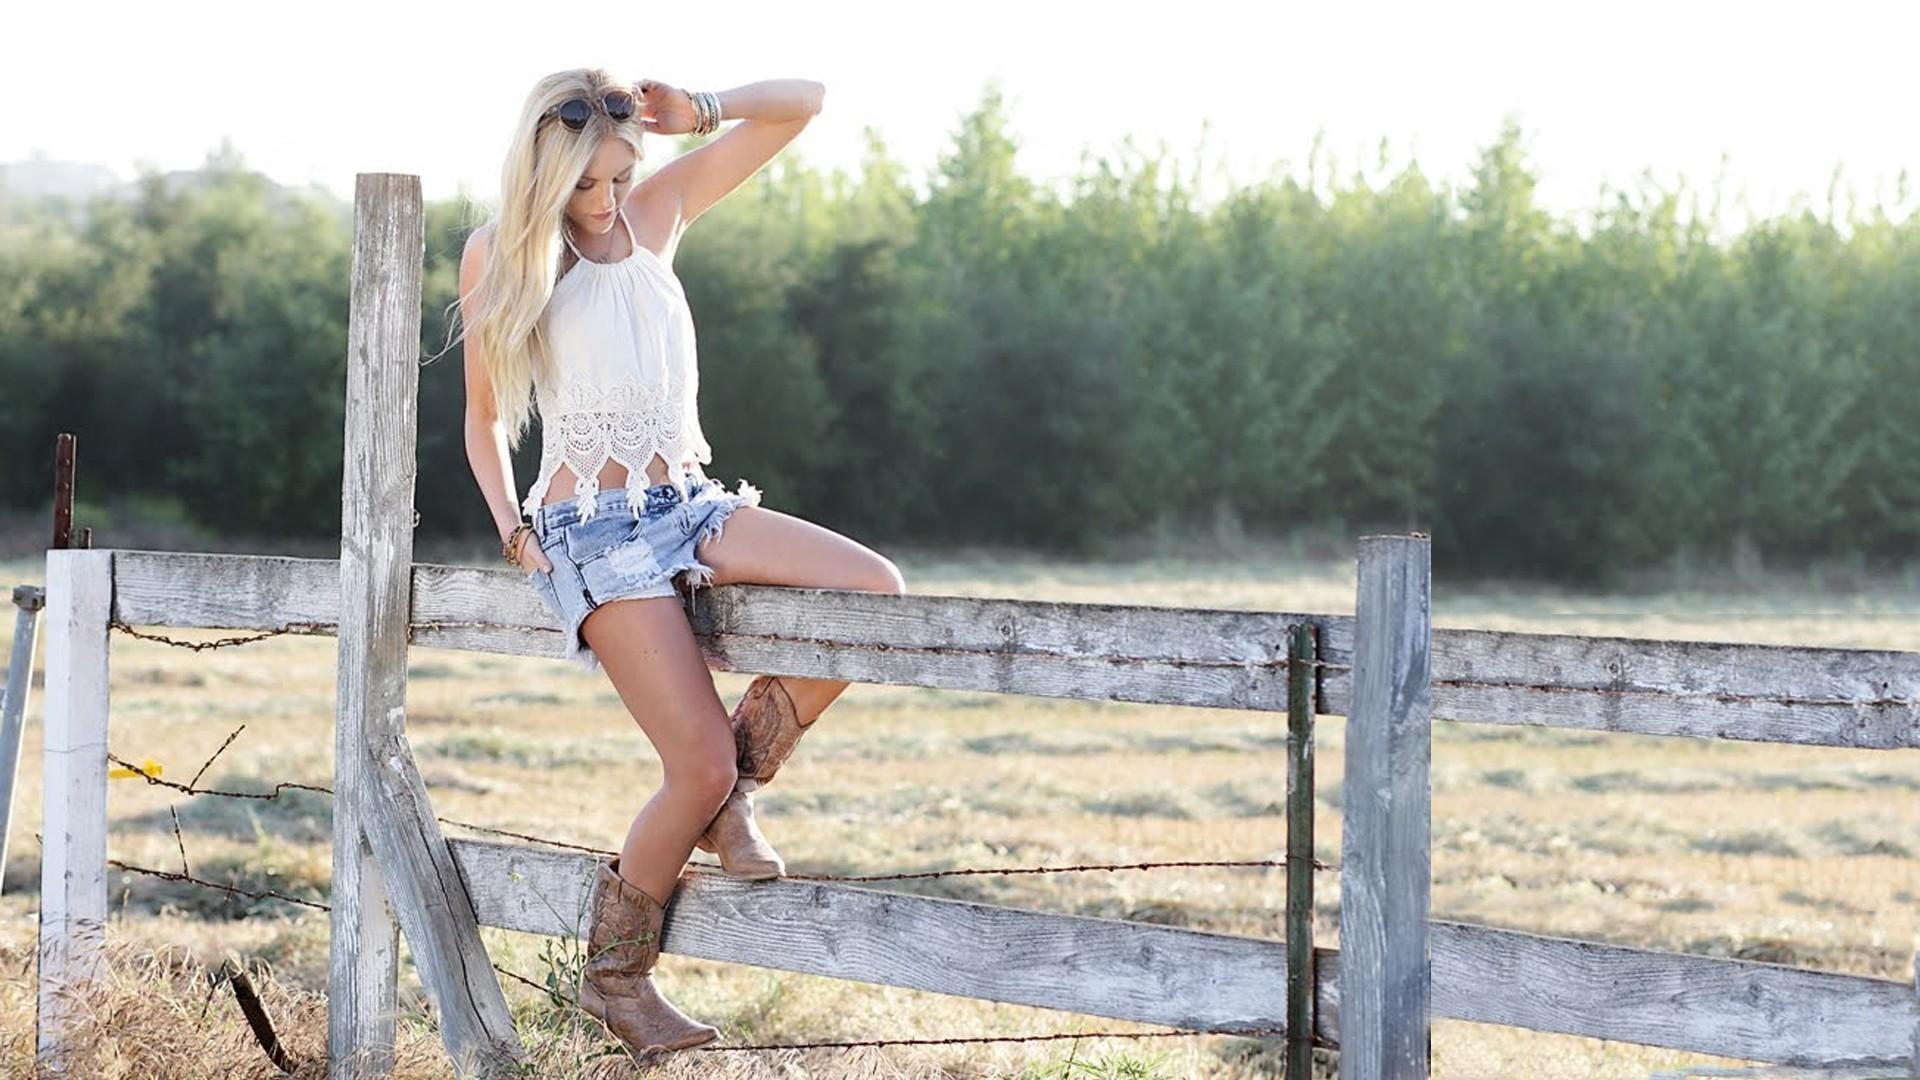 country-music-girls-hot-legs